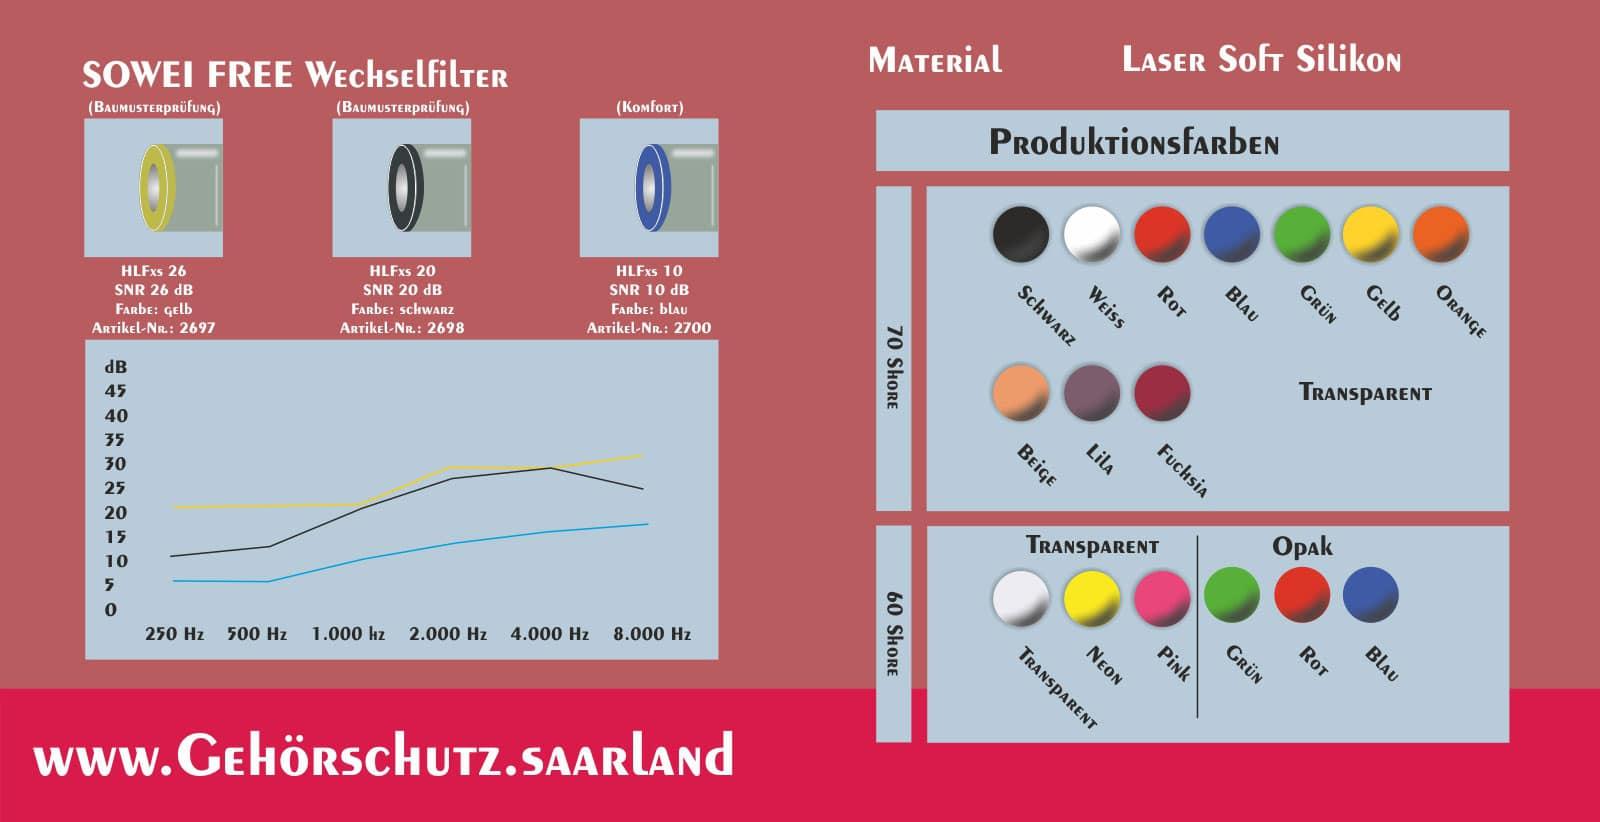 SOWEI free Gehörschutz Hörluchs - Gisbrecht Hörakustik Saarland - Farben, Wechselfilter und Dämmgrafik